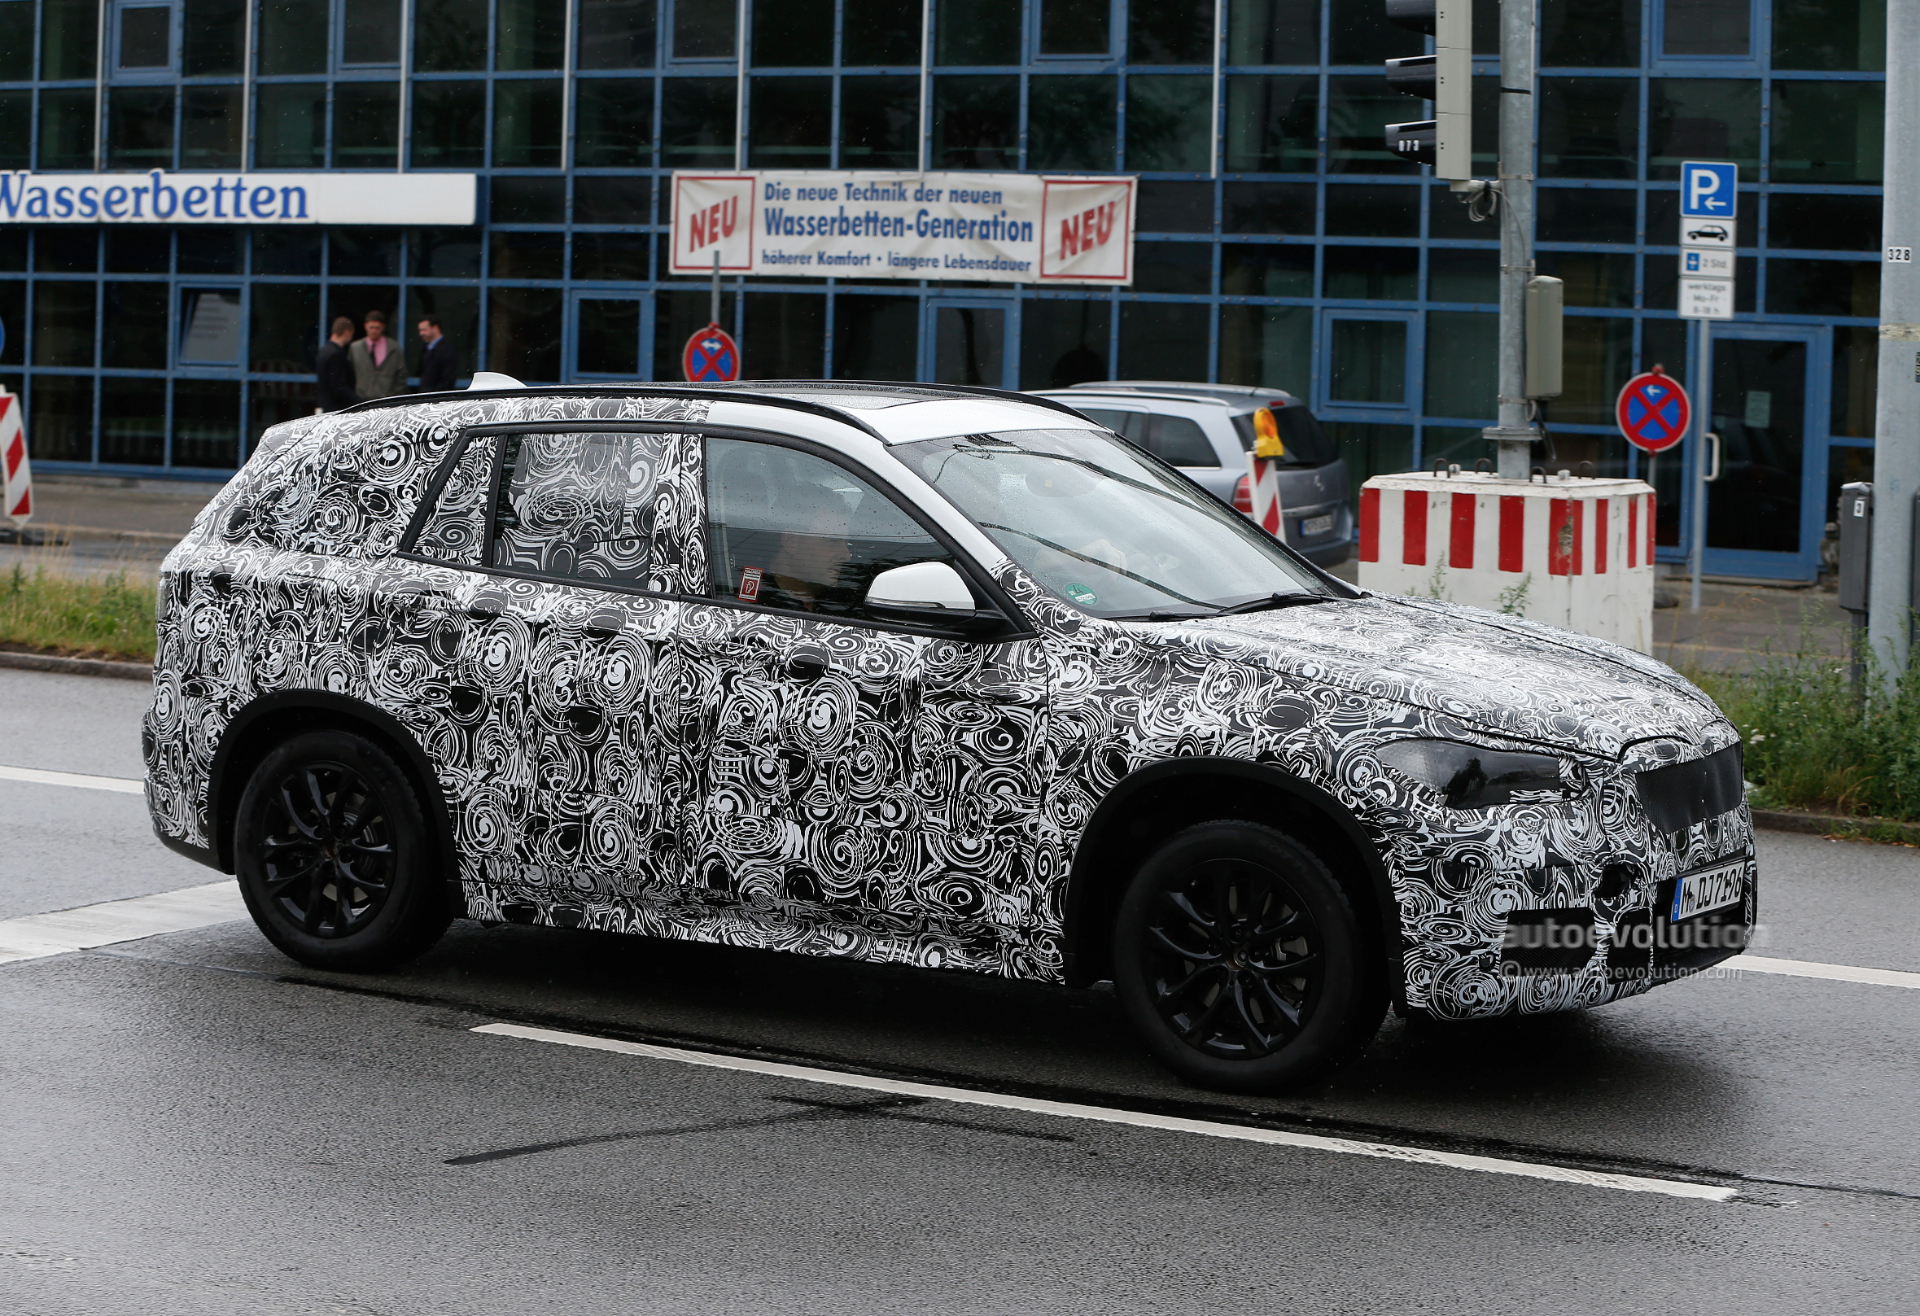 2015 - [BMW] X1 II [F48] - Page 5 2016-bmw-x1-spied-wearing-production-headlights-photo-gallery_3